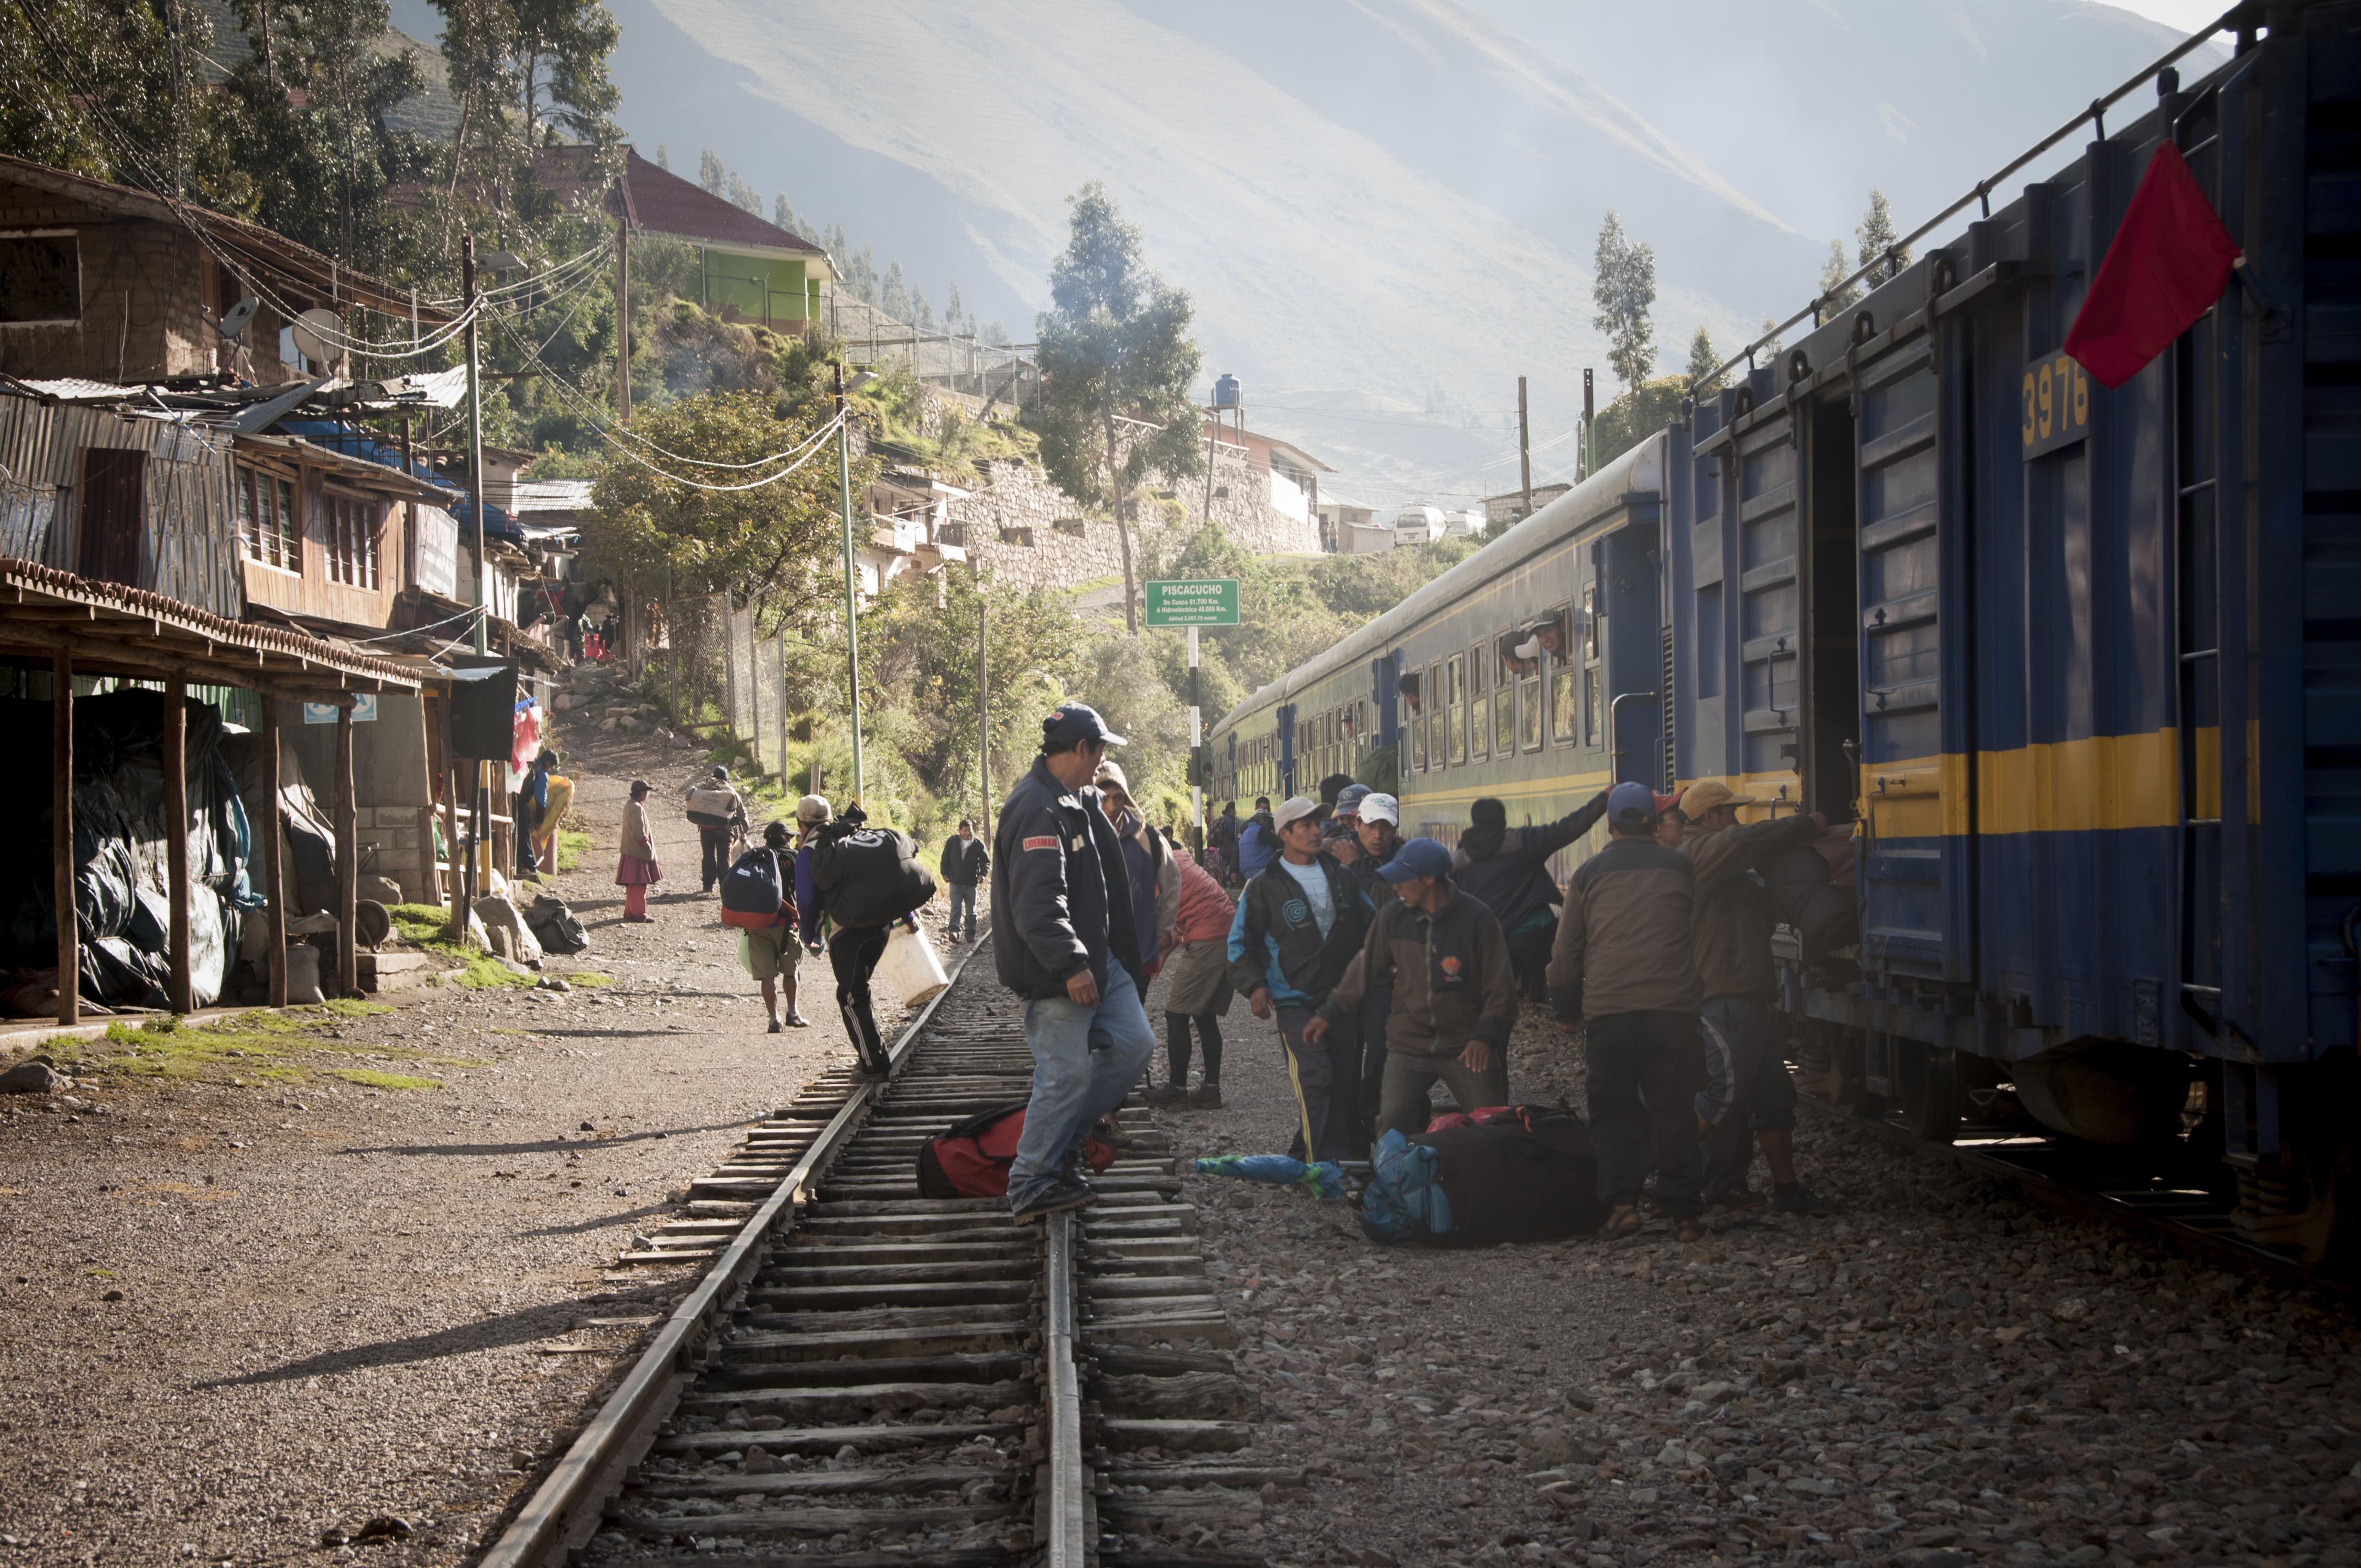 Peru 2013_Caminobarto a Machu Pichu. Sonsoles Lozano.